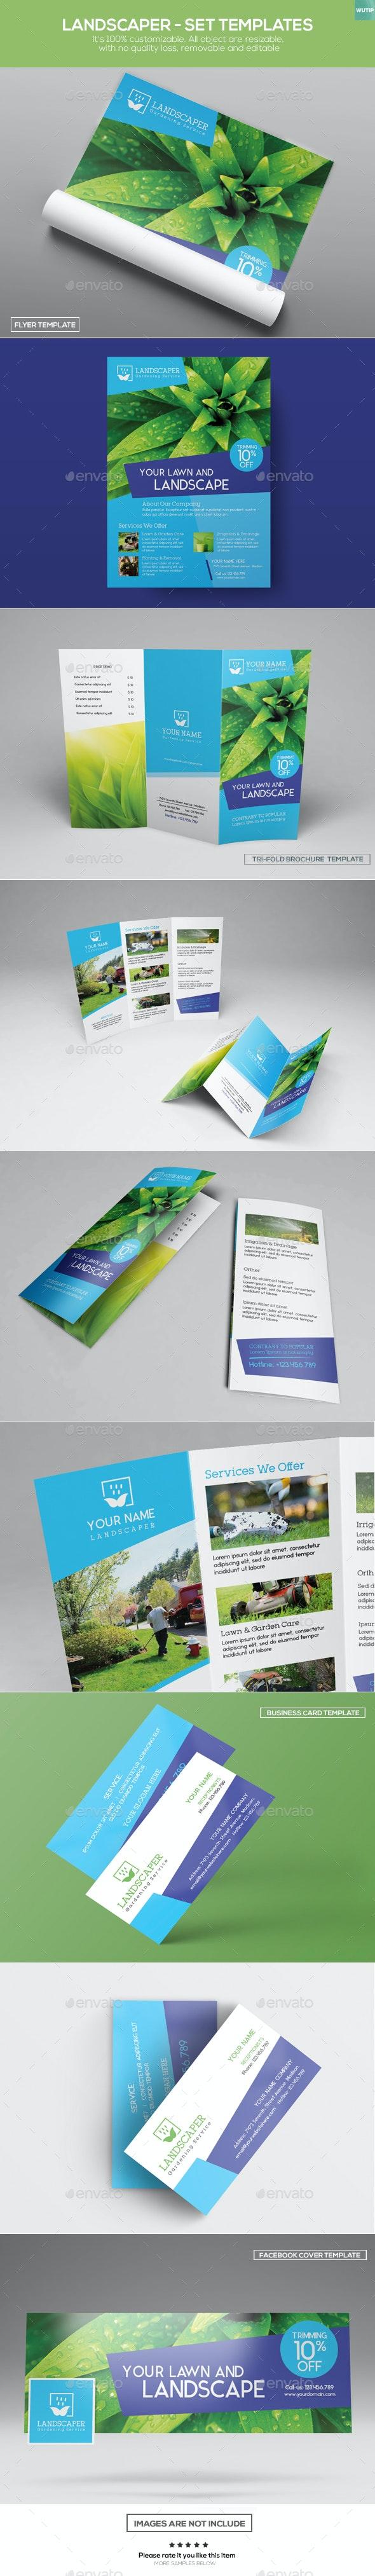 Landscaper - Set Templates - Commerce Flyers